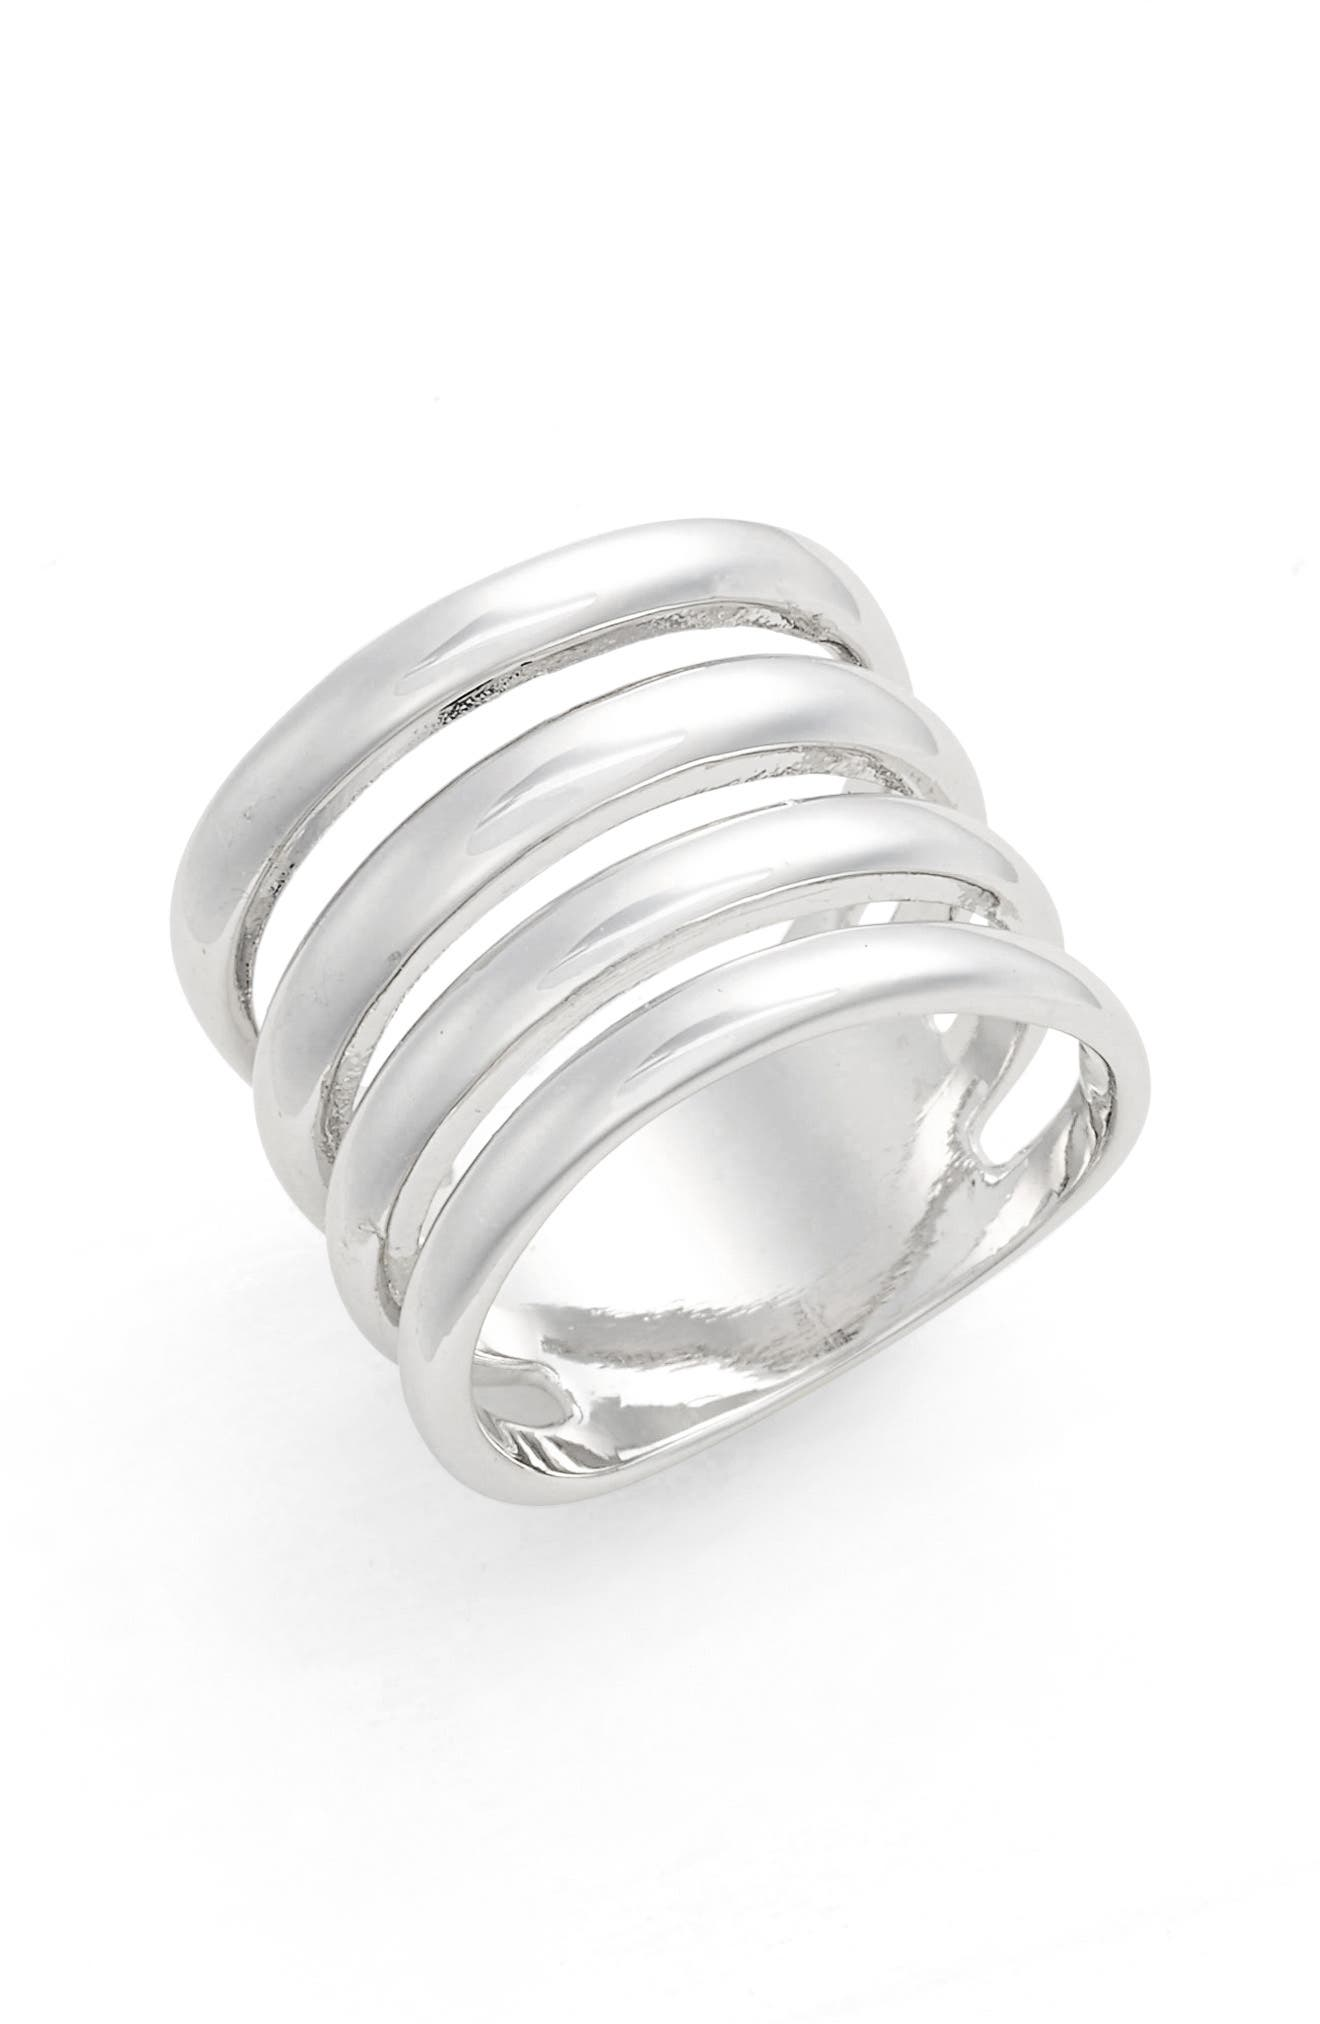 Main Image - Argento Vivo Openwork Ring